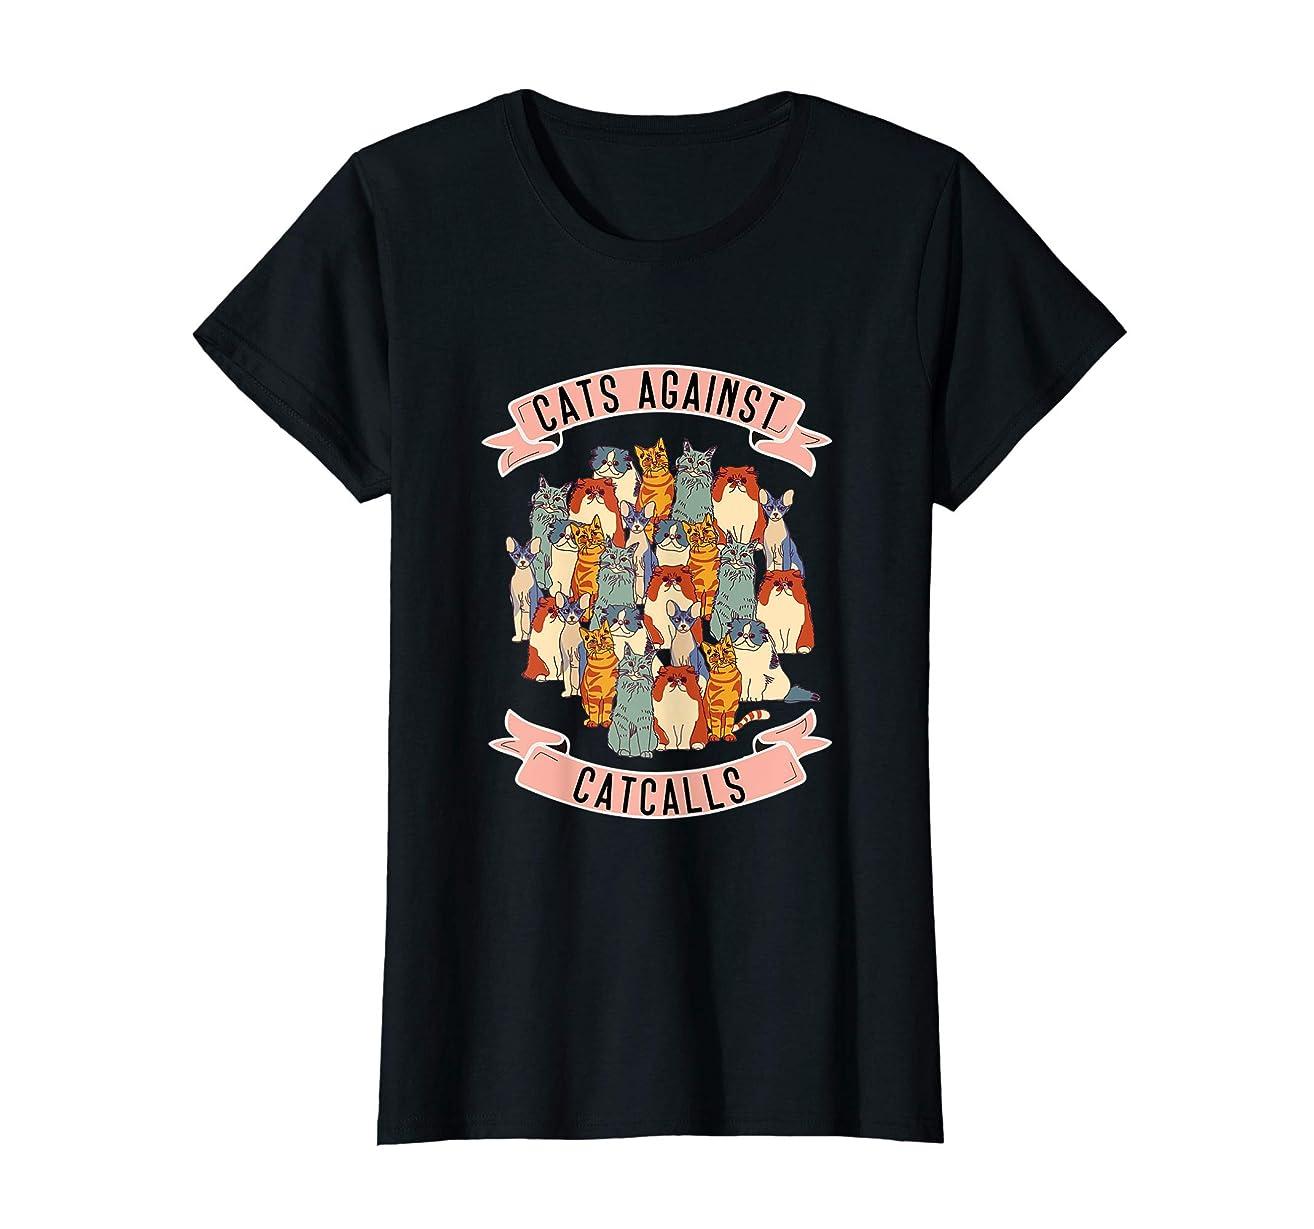 Womens Cats Against Catcalls Feminist T shirt